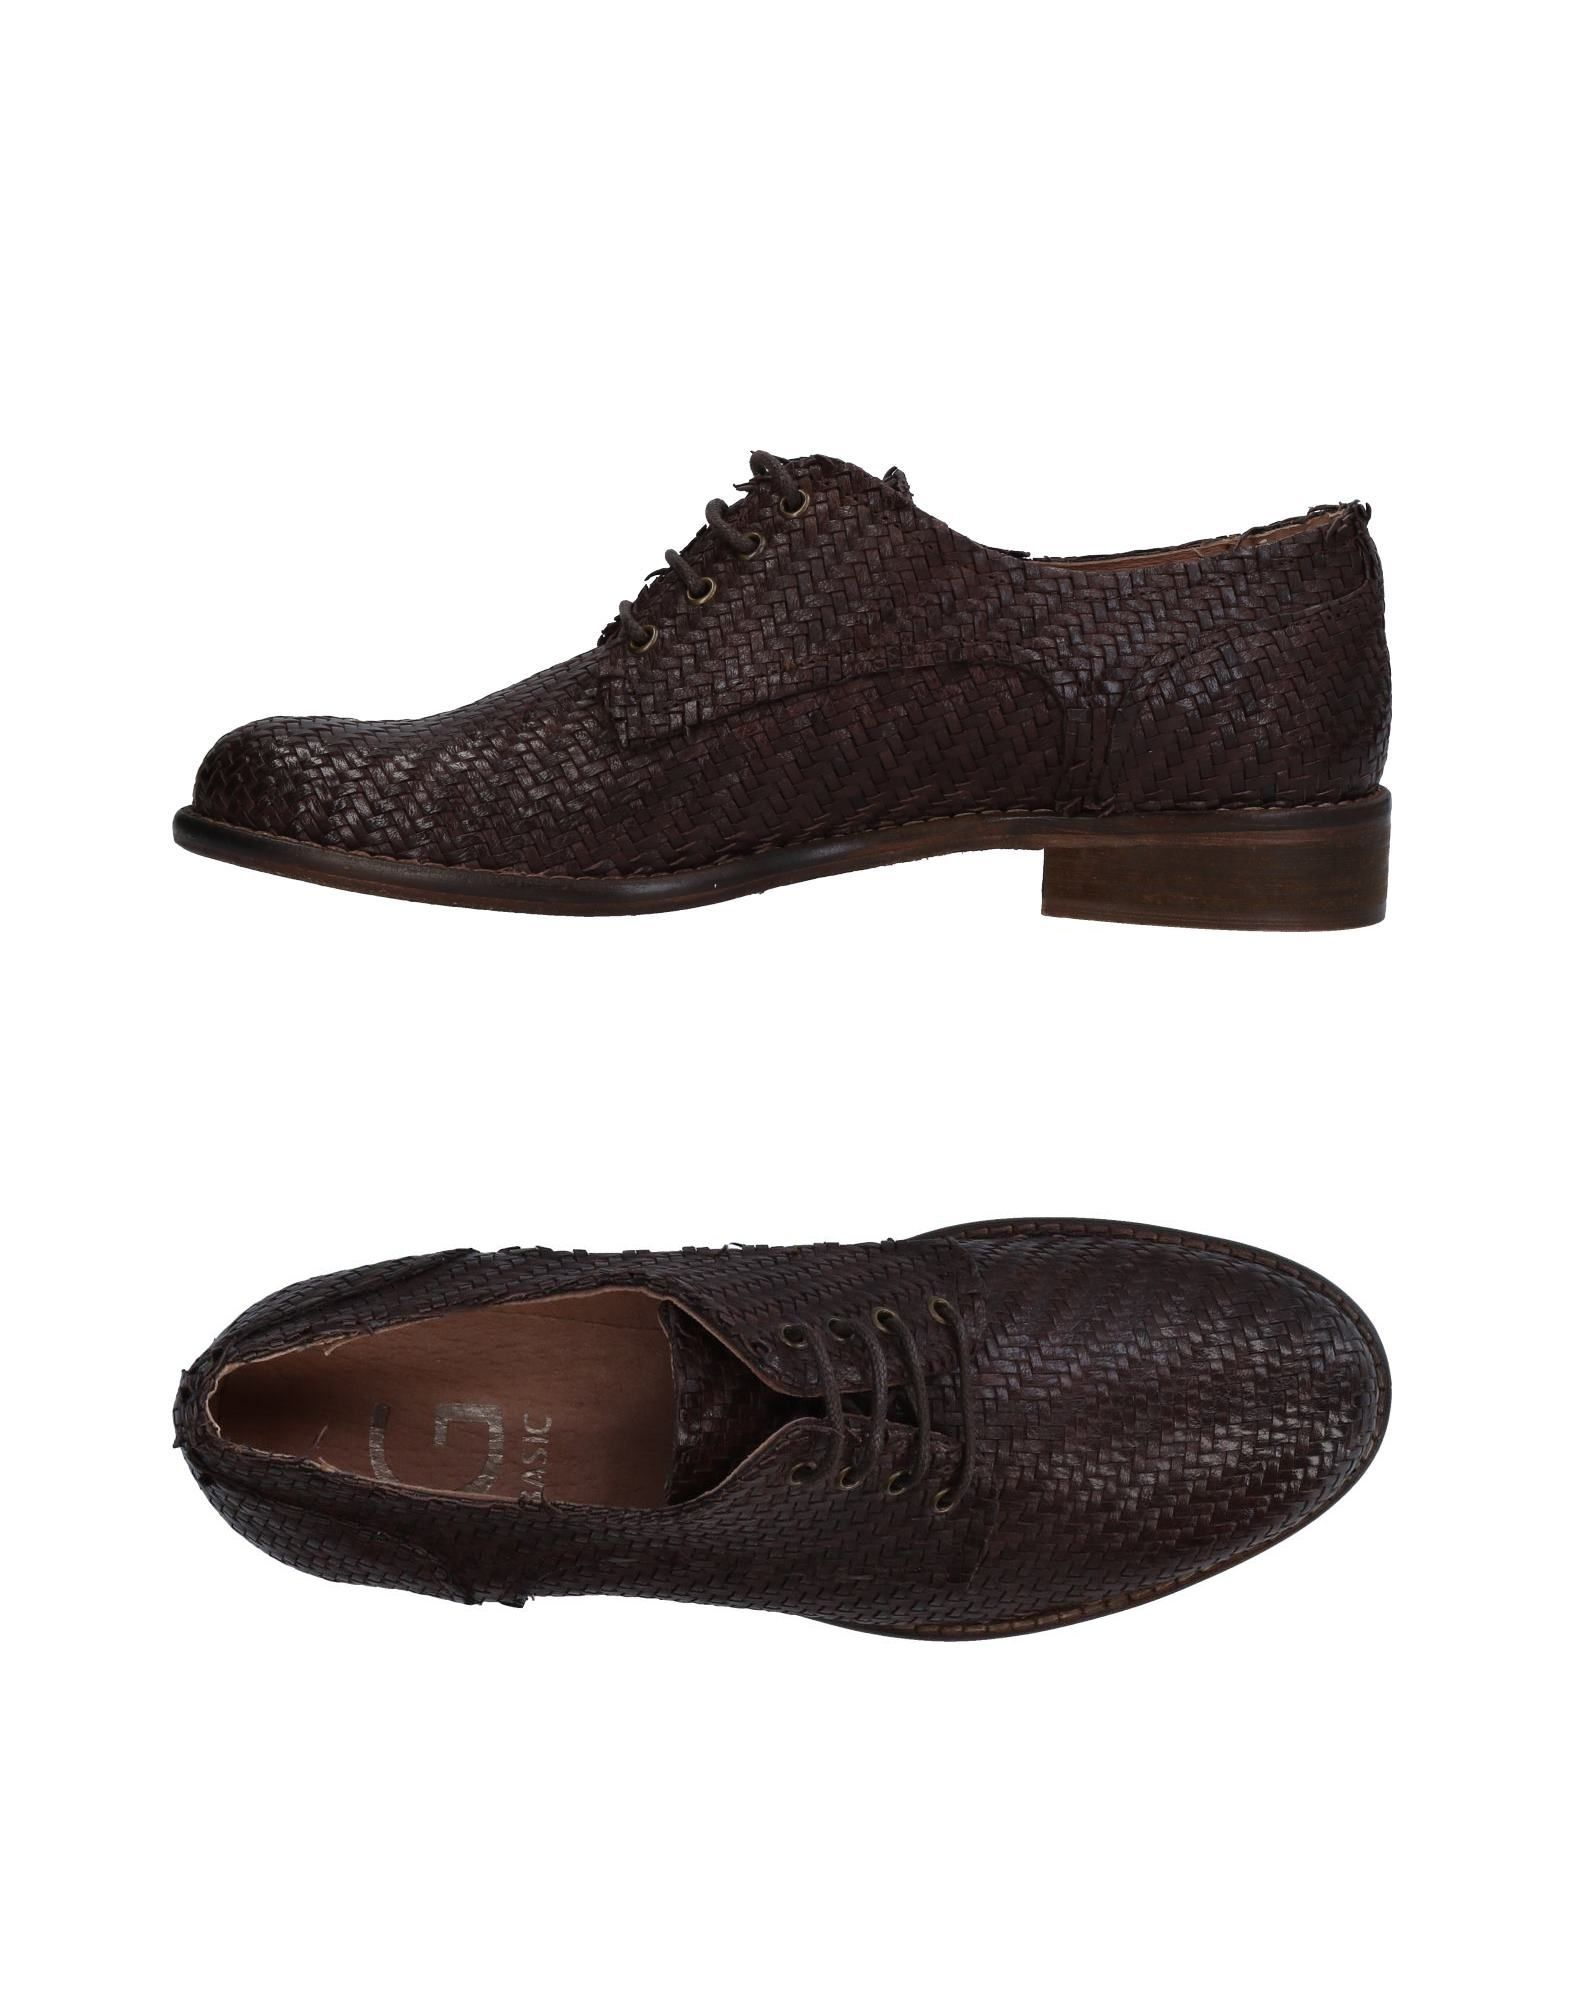 G Basic Schnürschuhe Damen  11462418AD Gute Qualität beliebte Schuhe